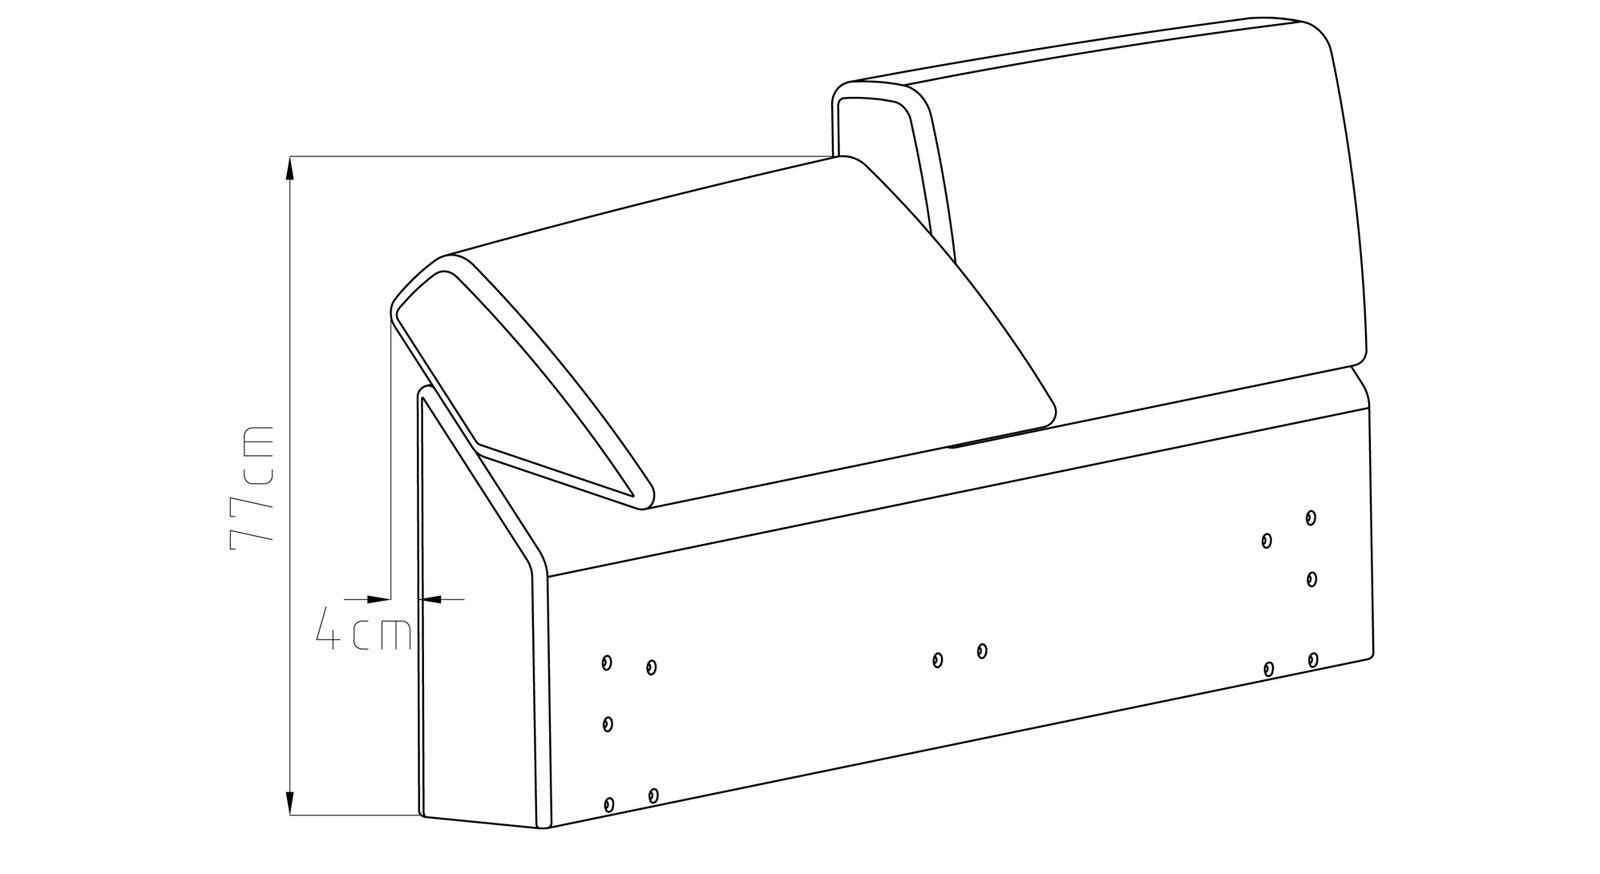 elegantes bett kopfteil selber machen ebenbild erindzain. Black Bedroom Furniture Sets. Home Design Ideas